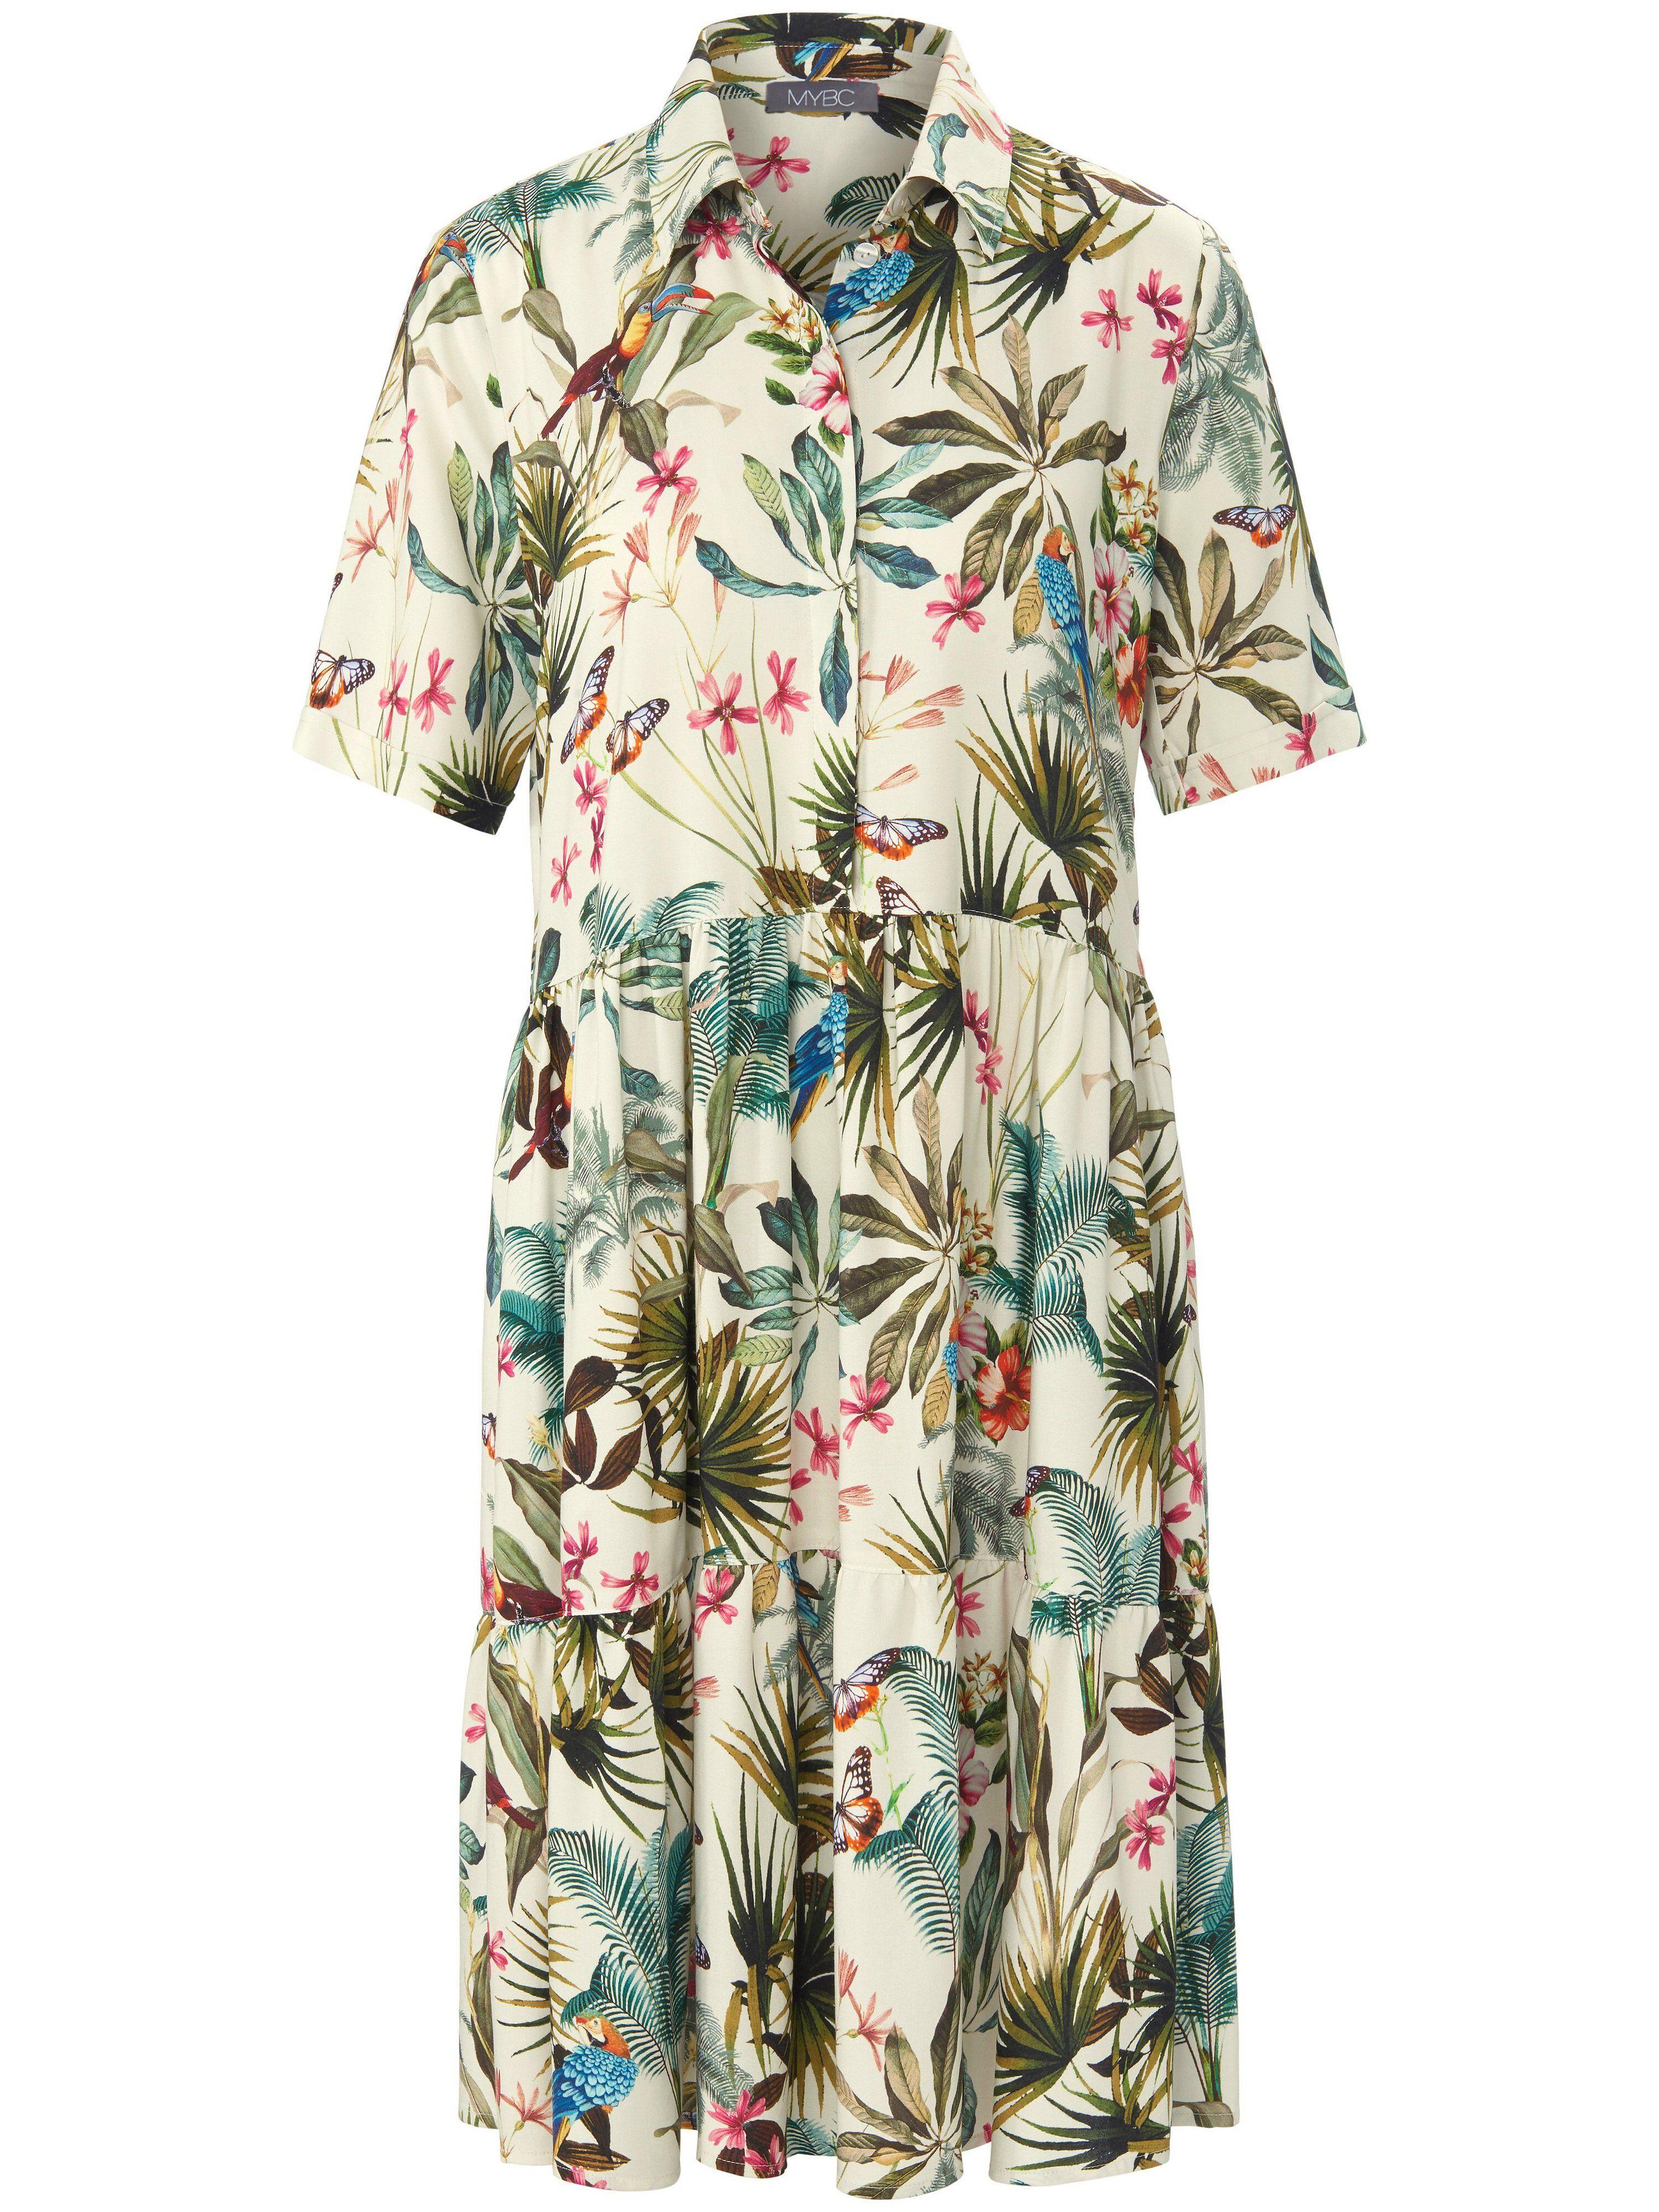 MYBC La robe ligne fluide  MYBC multicolore  - Femme - 38